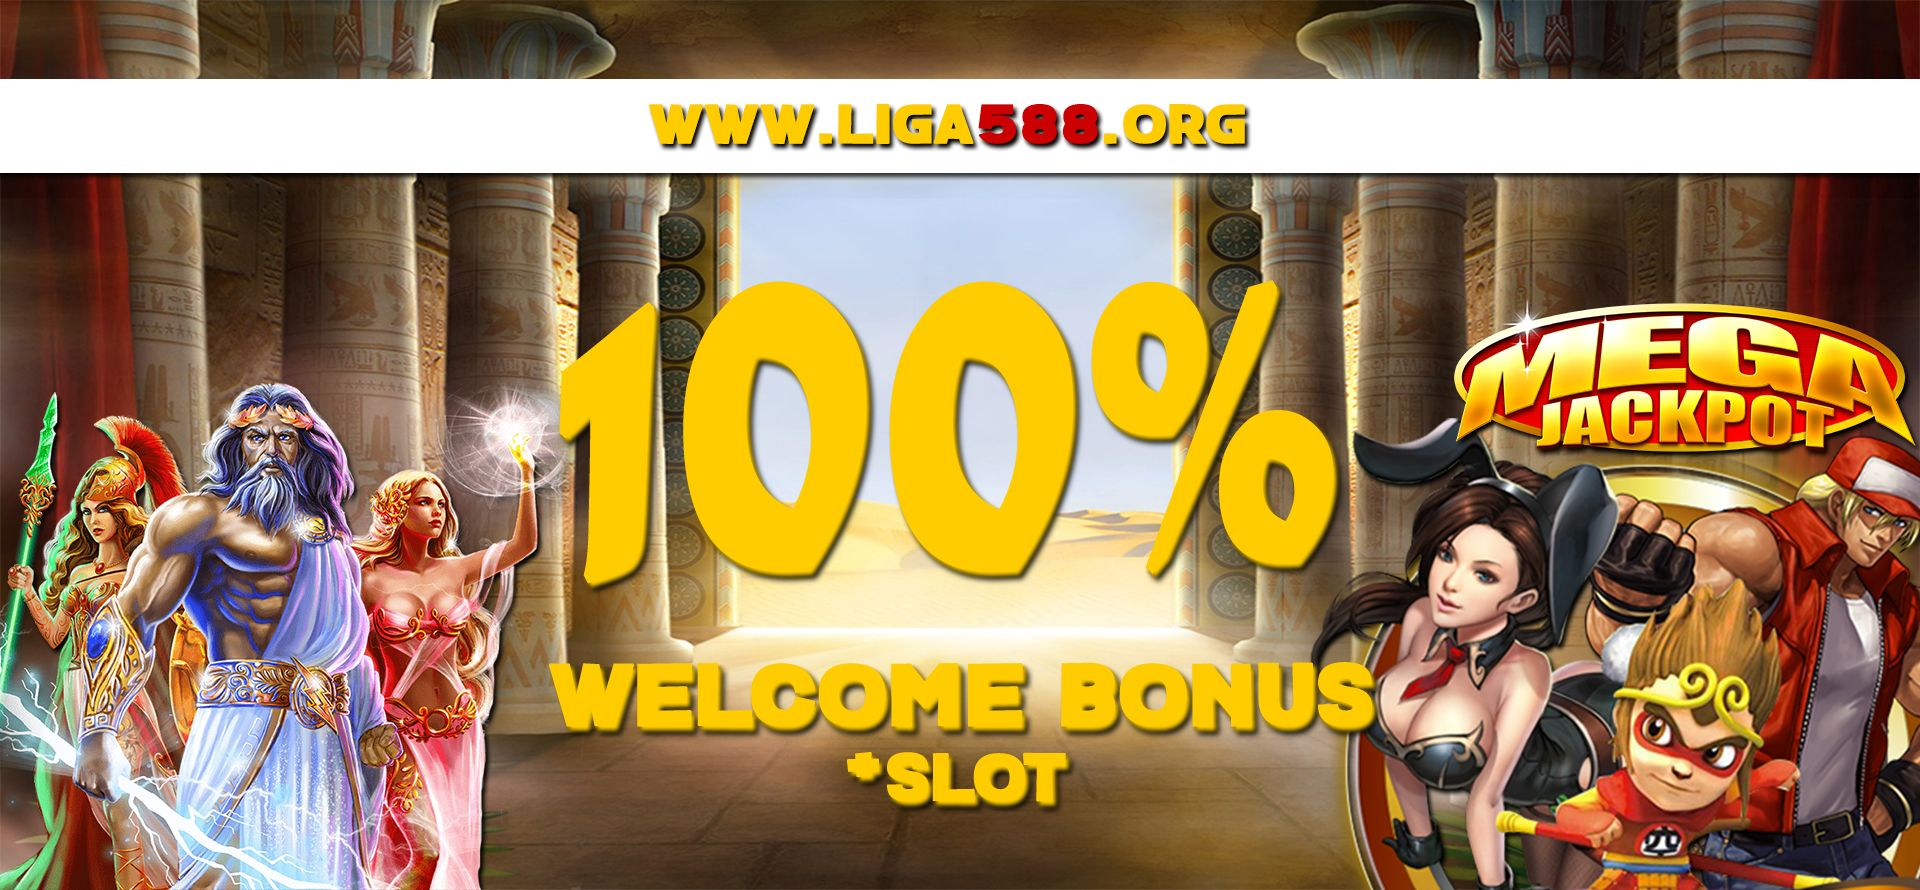 Promo Welcome Bonus Slot 100 Liga588